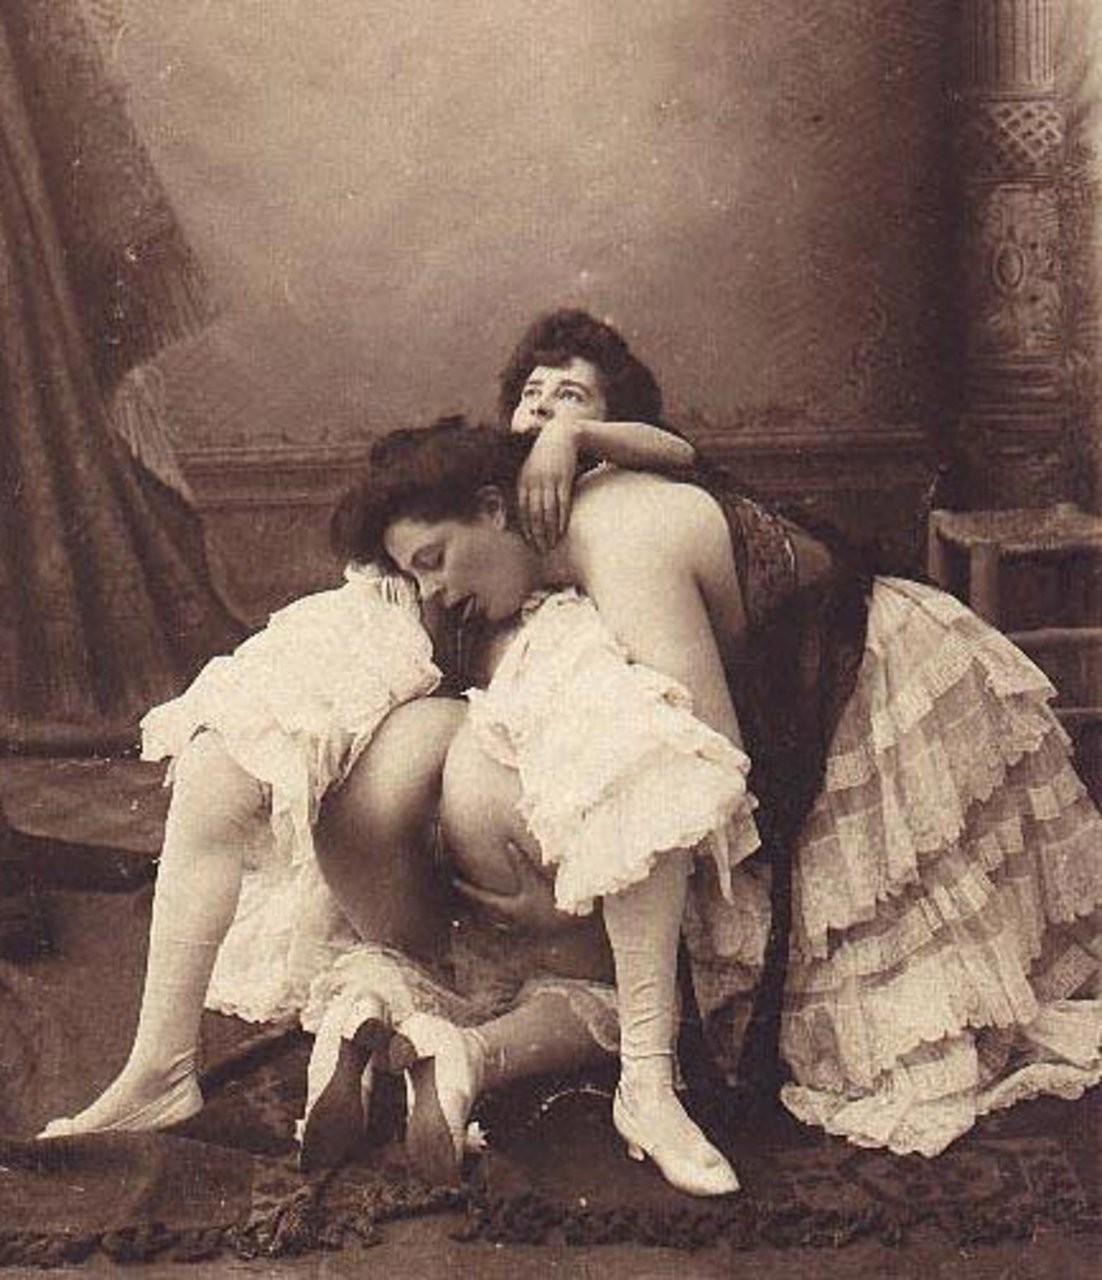 audrey tautou lookalike – Erotic